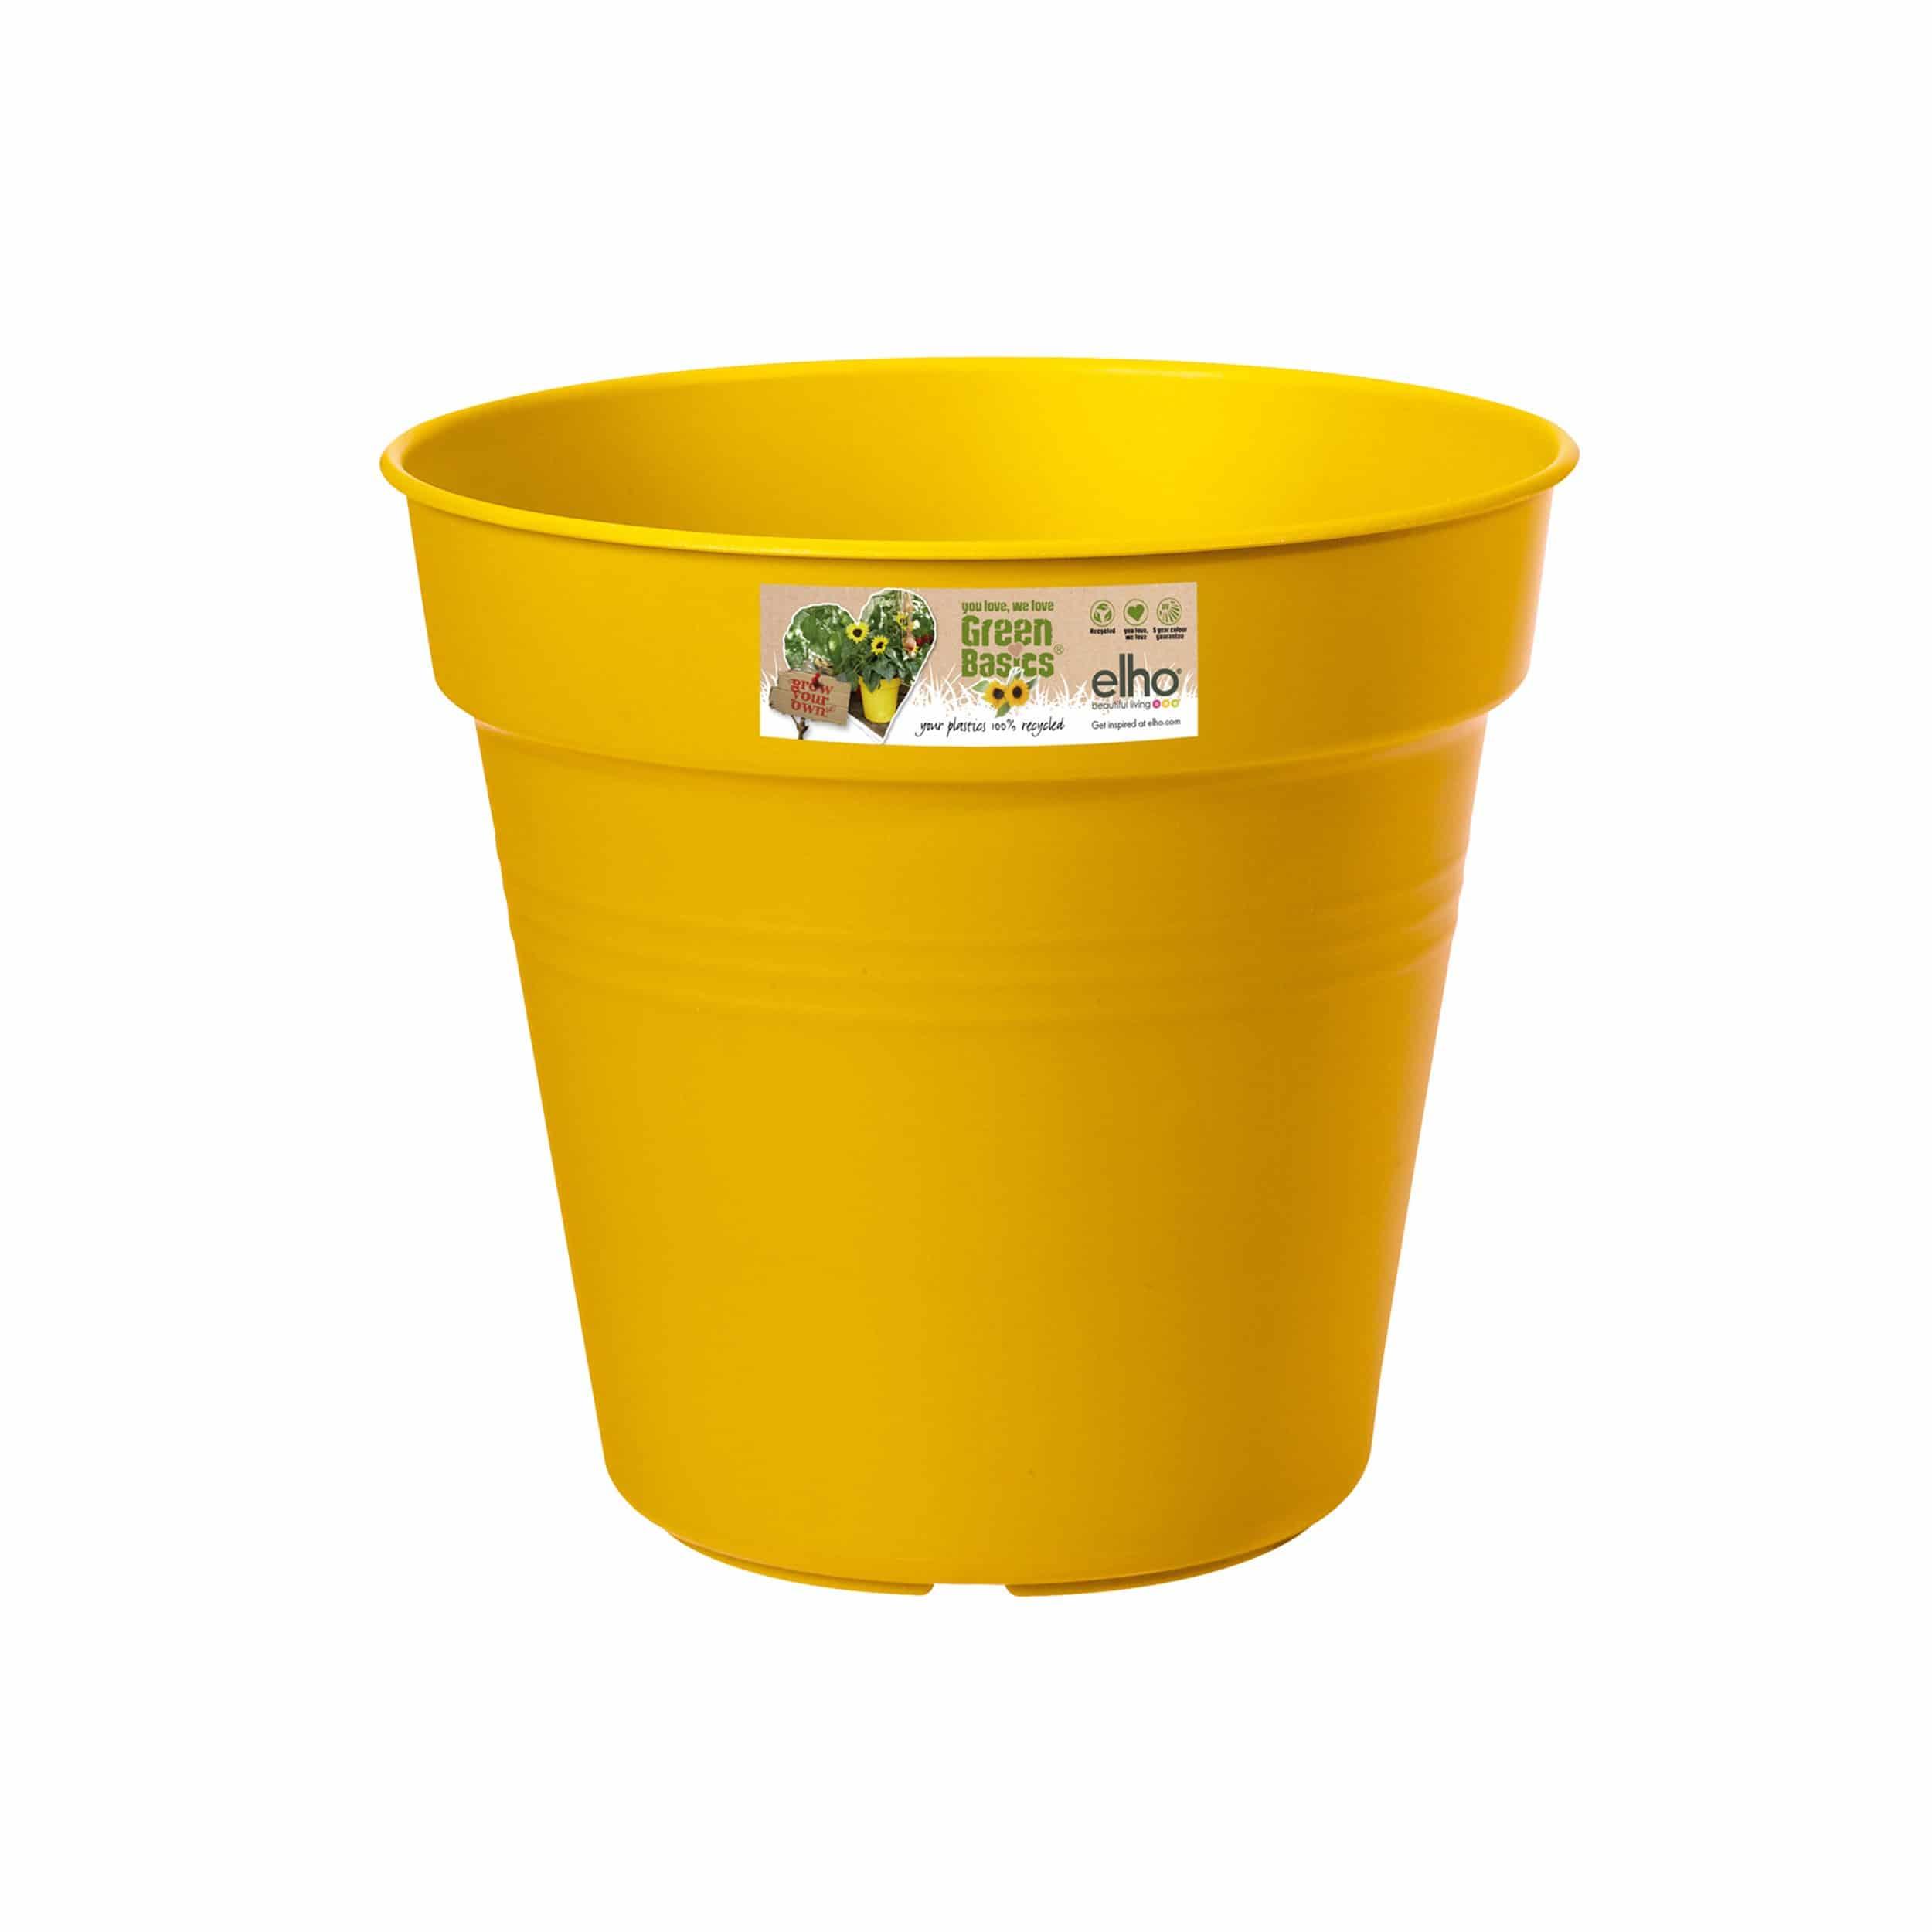 Pflanztopf Green Basics D30cm gelb